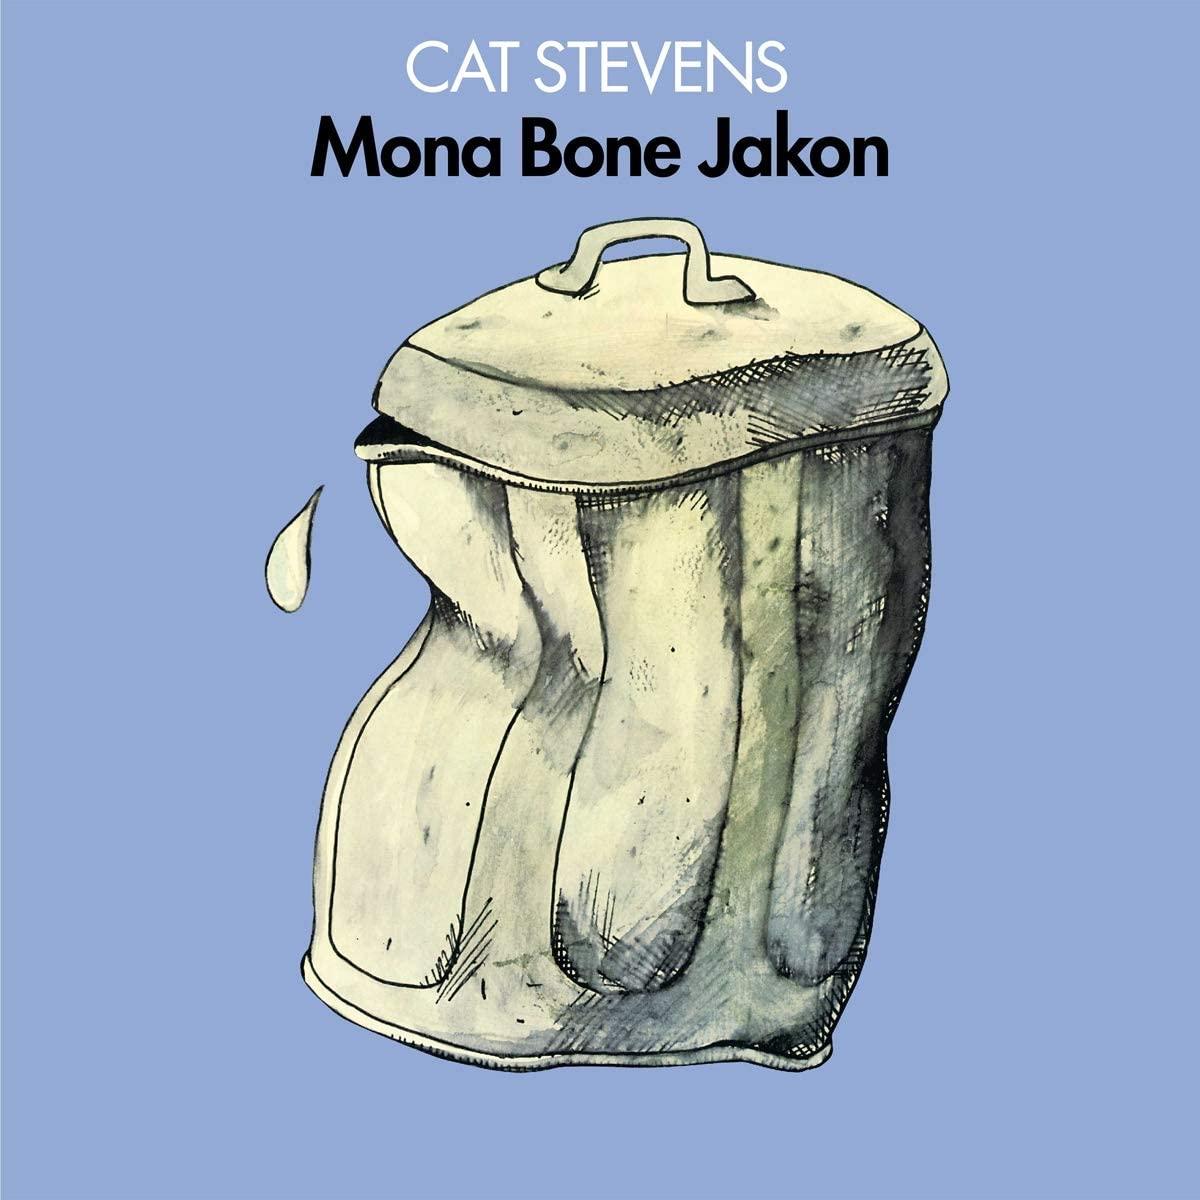 Cat Stevens - Mona Bone Jakon 50th Anniversary Remastered Vinyl £12.70 (+£2.99 non Prime) @ Amazon